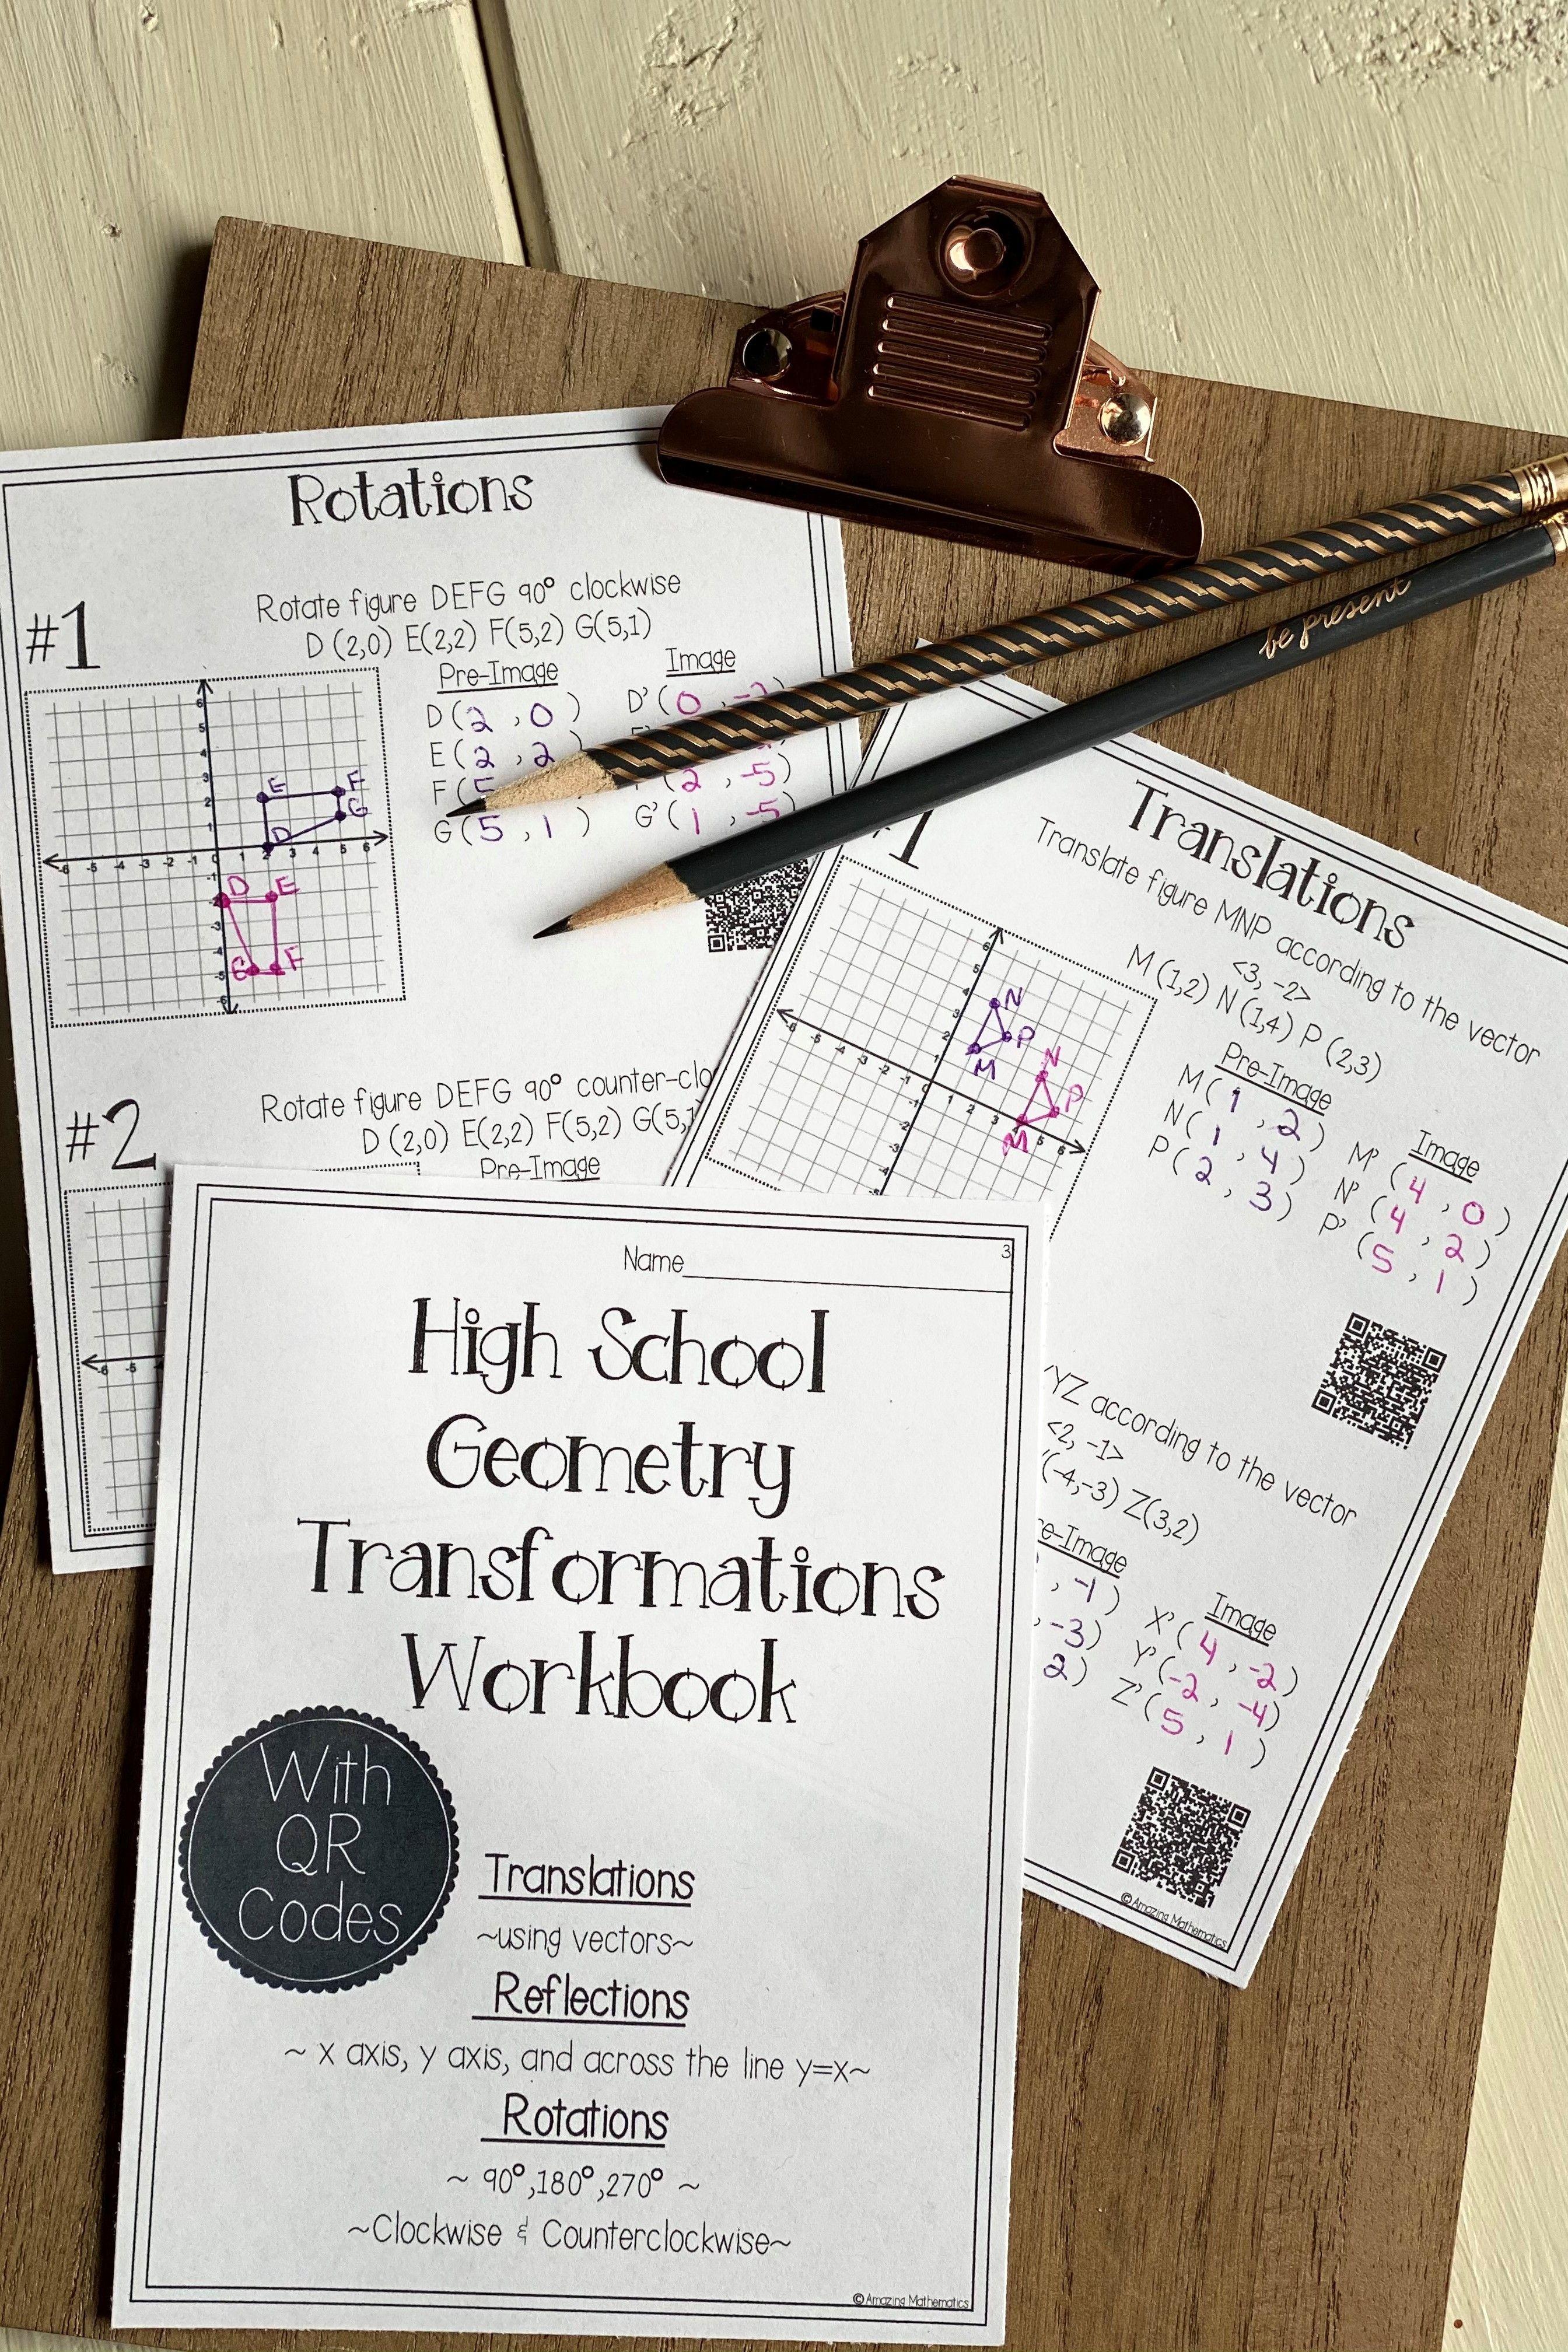 Hs Geometry Transformations Workbook Translations Rotations Reflections Hs Geometry Workbook Geometry Worksheets [ 4032 x 2688 Pixel ]